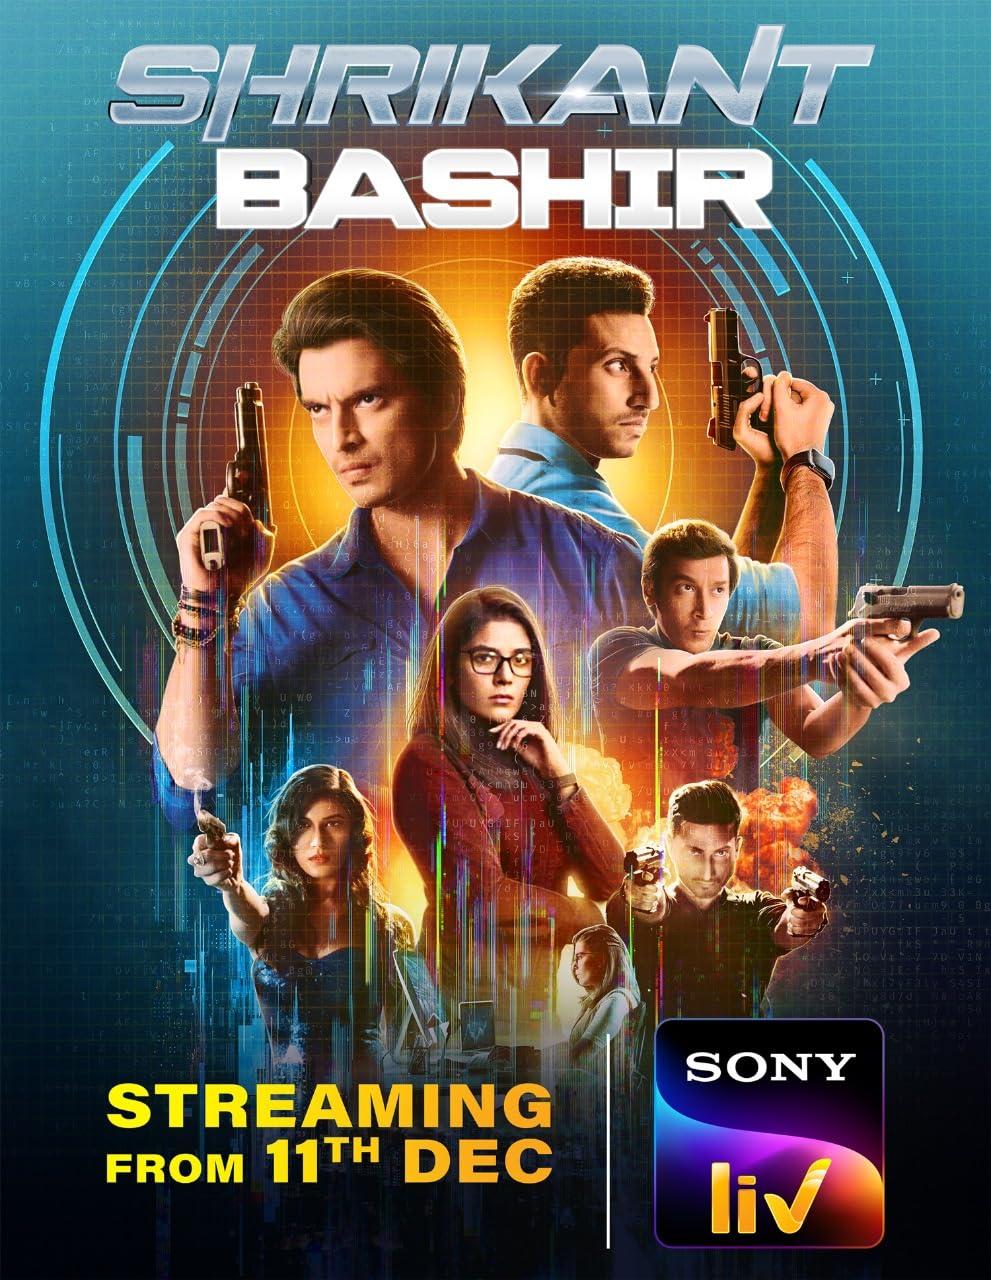 Shrikant Bashir (2020) S01 Complete SonyLiv 720p | 480p WEB-DL x264 AAC